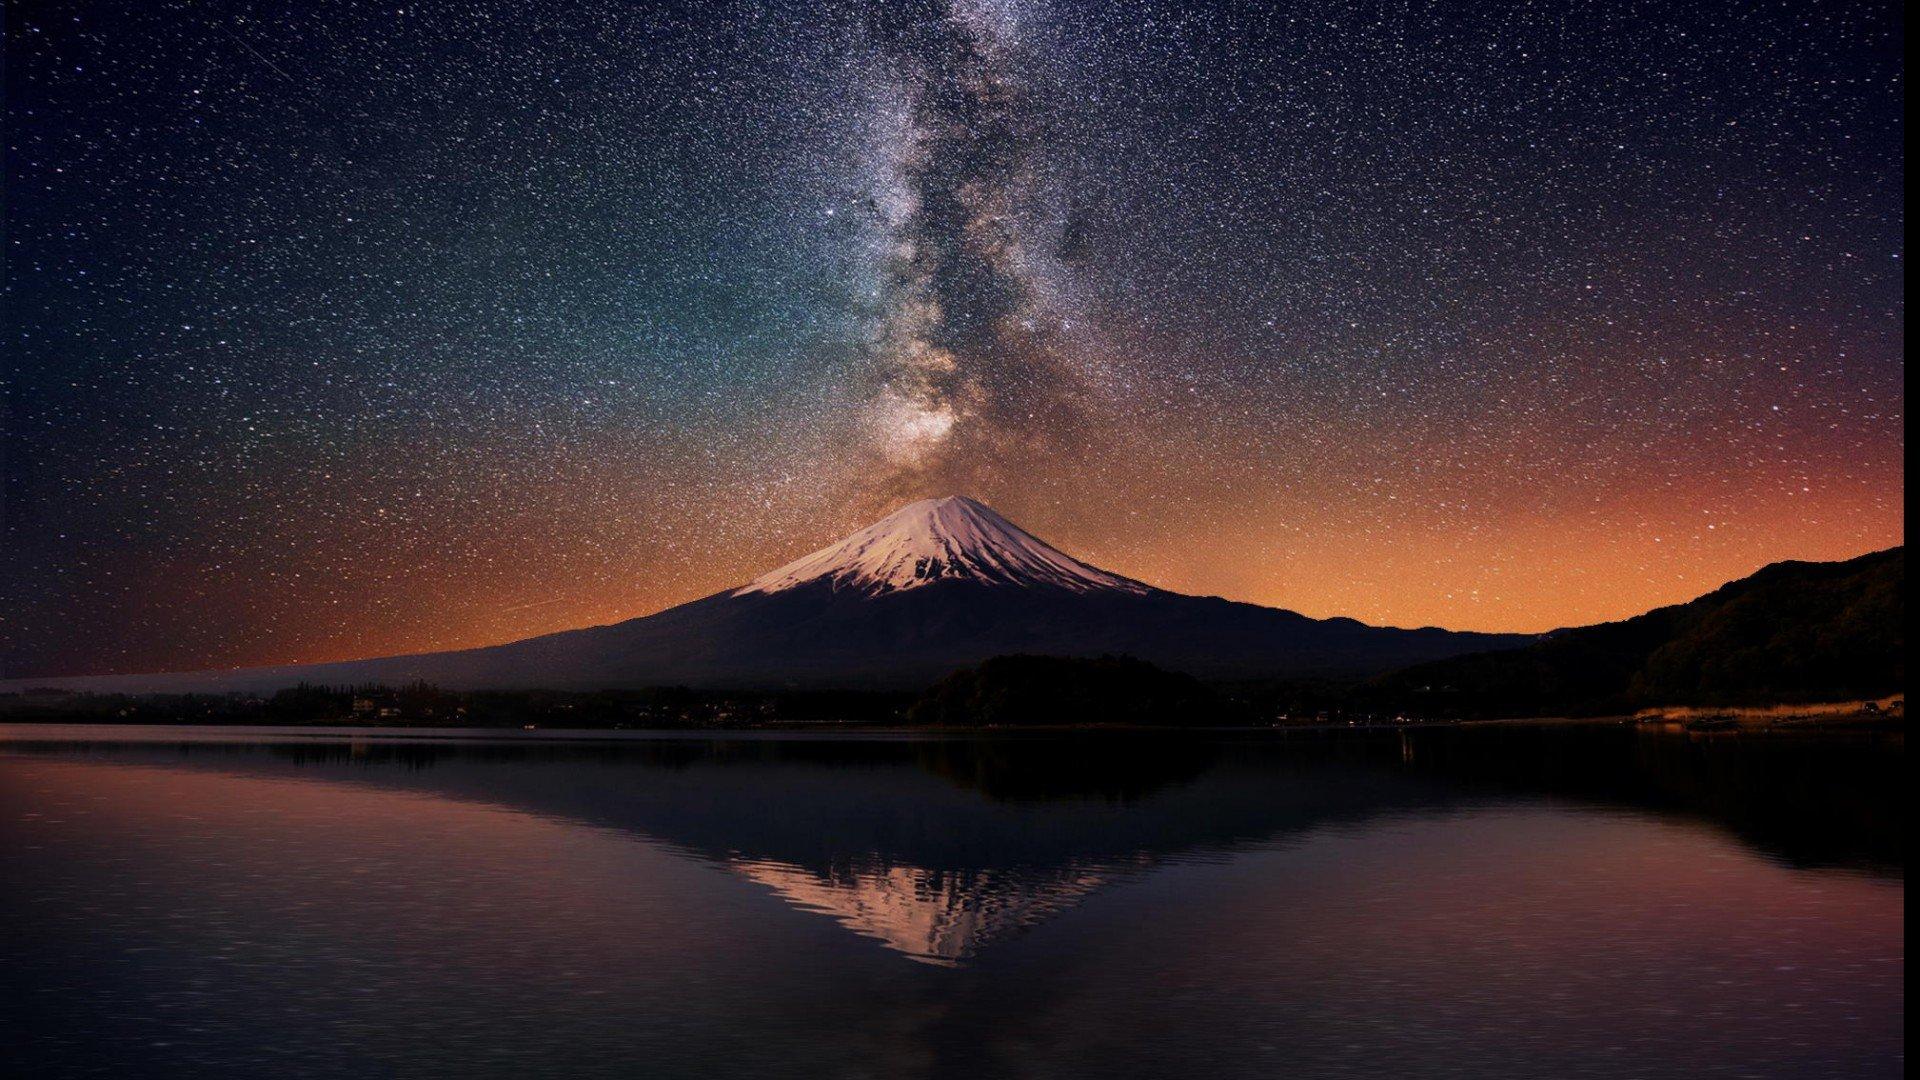 Milky Way Wallpaper 1920x1080 71 Images: -the-milky-way-over-mount-fuji-japan-stars Wallpaper